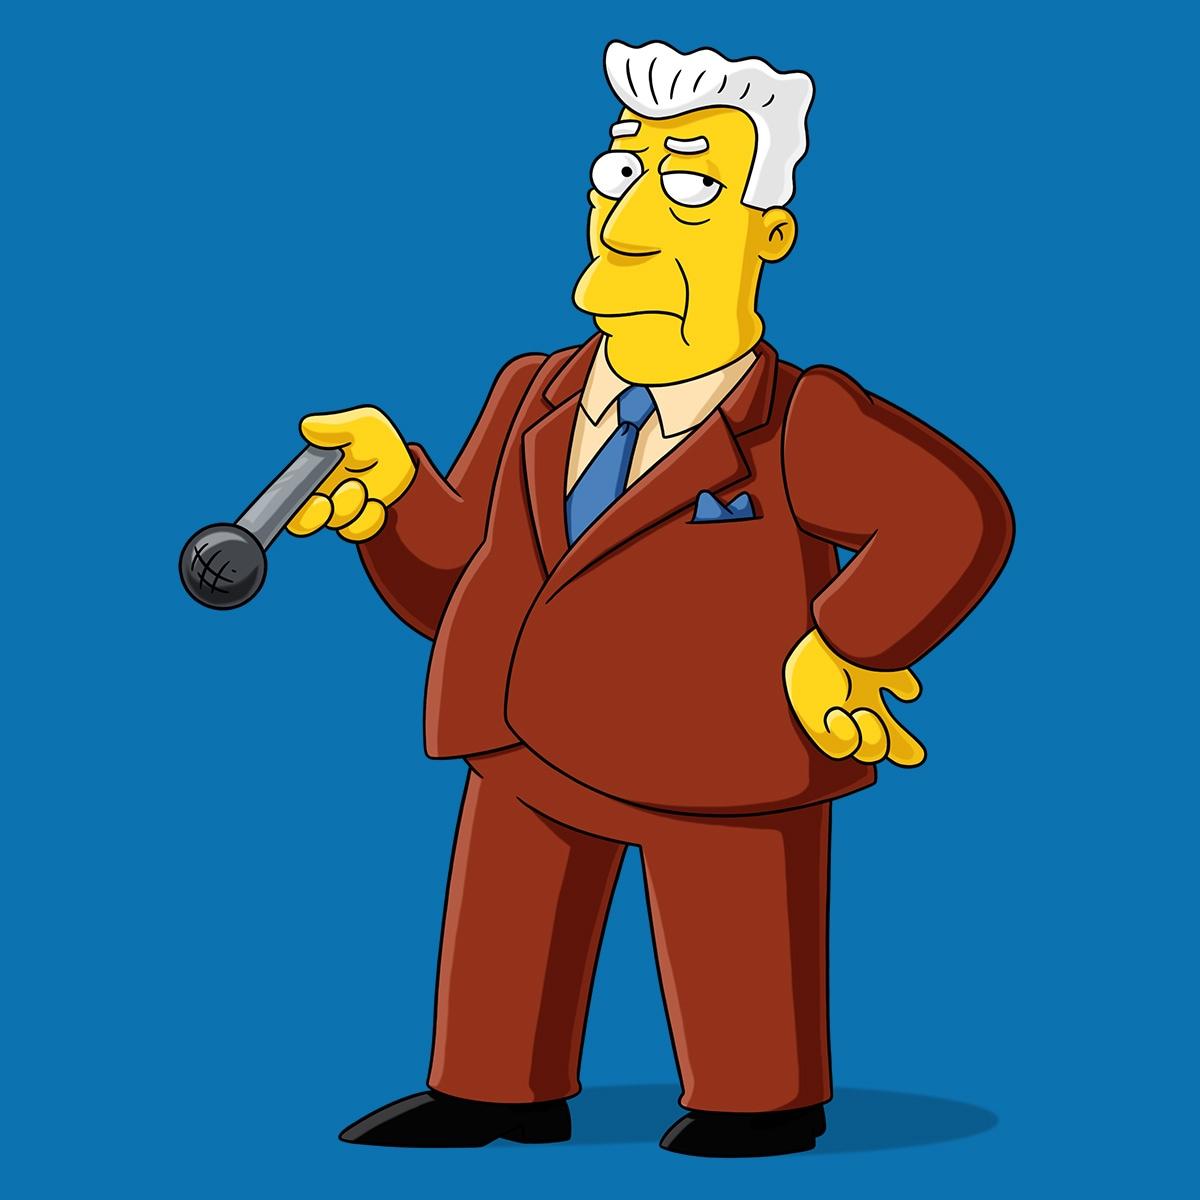 Kent Brockman | Simpsons World on FXX